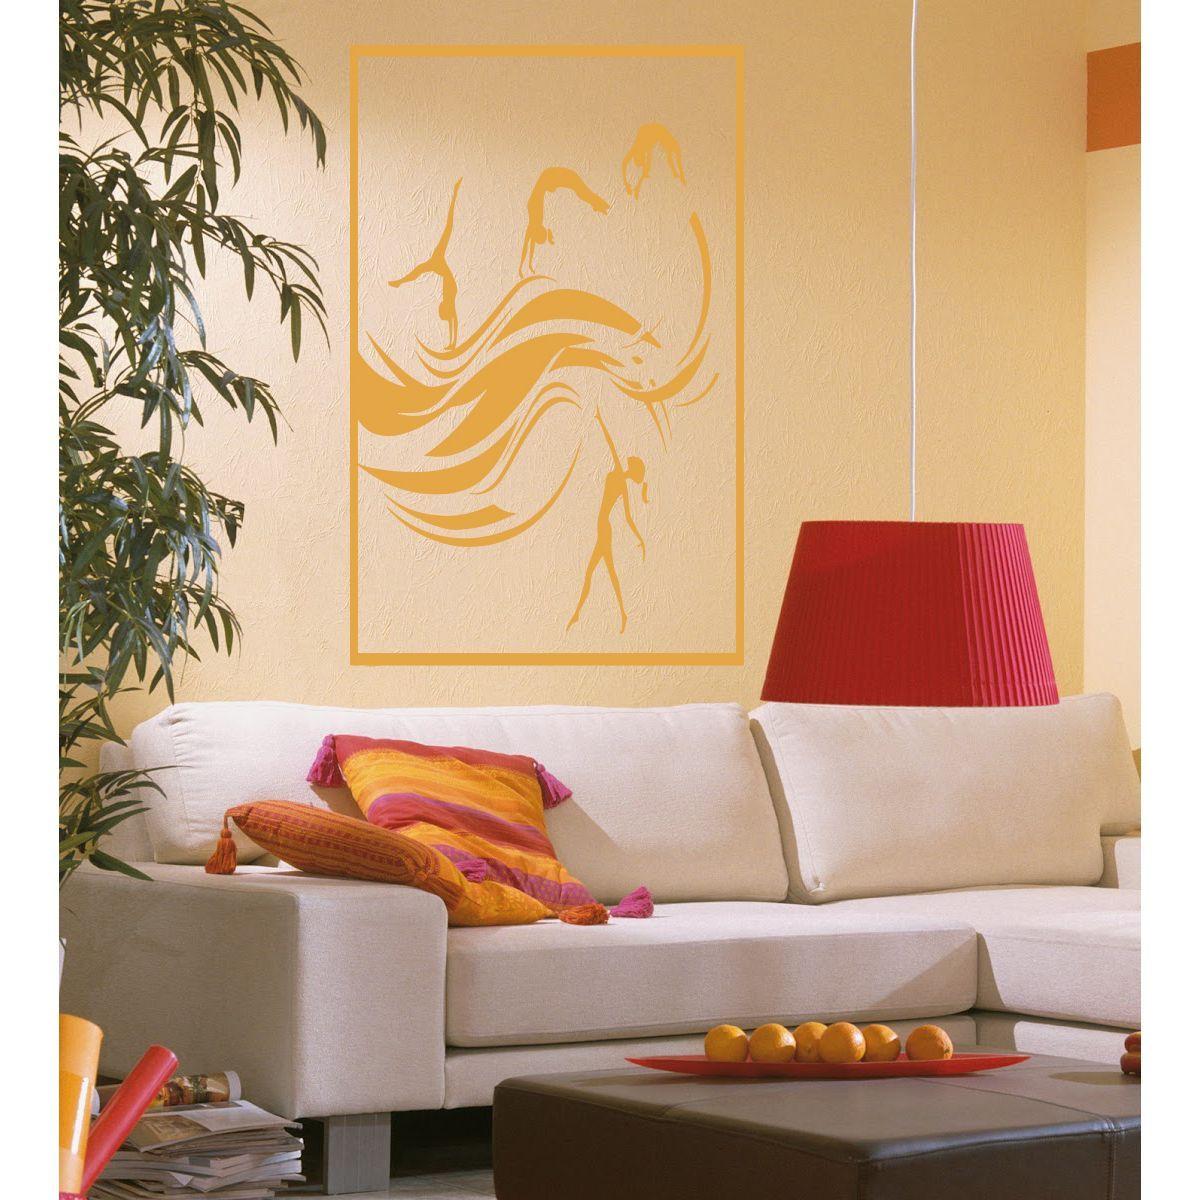 Amazing Dance Wall Art Ideas - The Wall Art Decorations ...